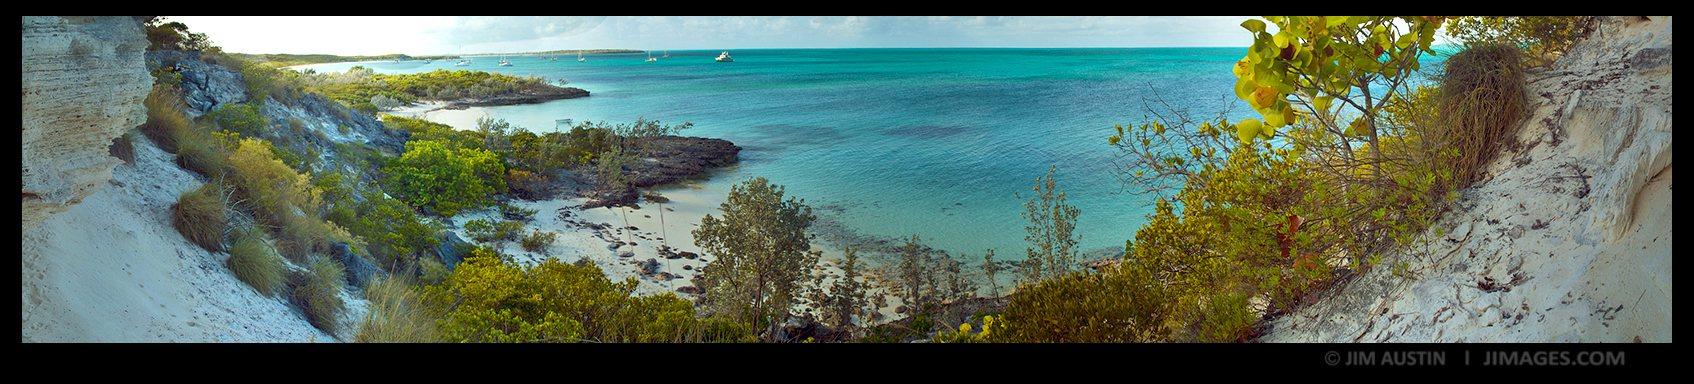 panorama-hog-cay-jim-austin-jimages